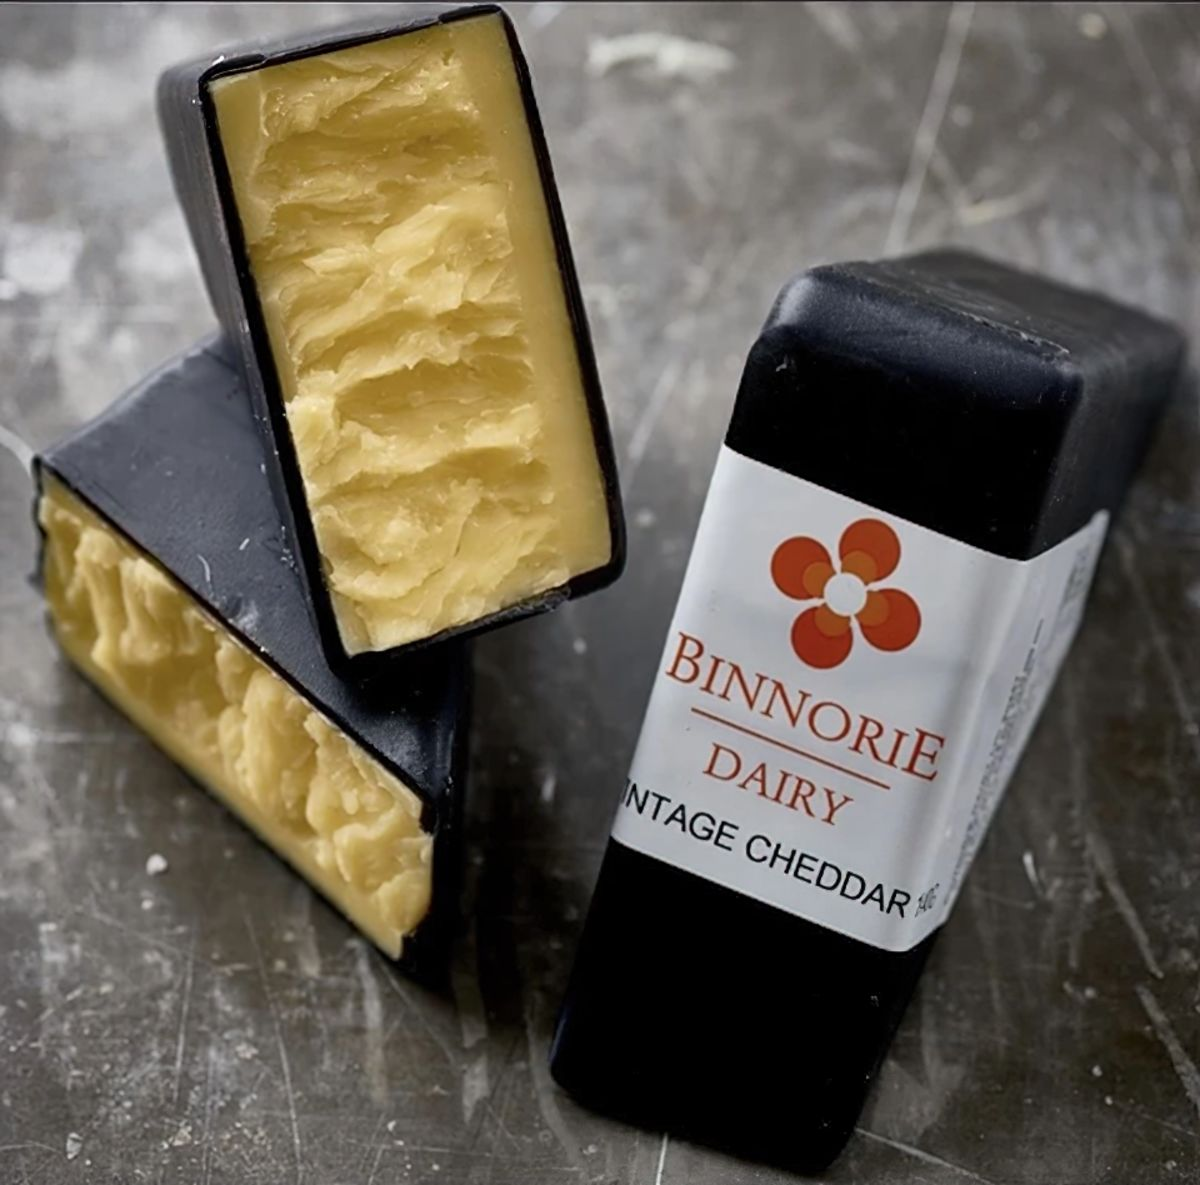 Binnorie Dairy - Vintage Cheddar